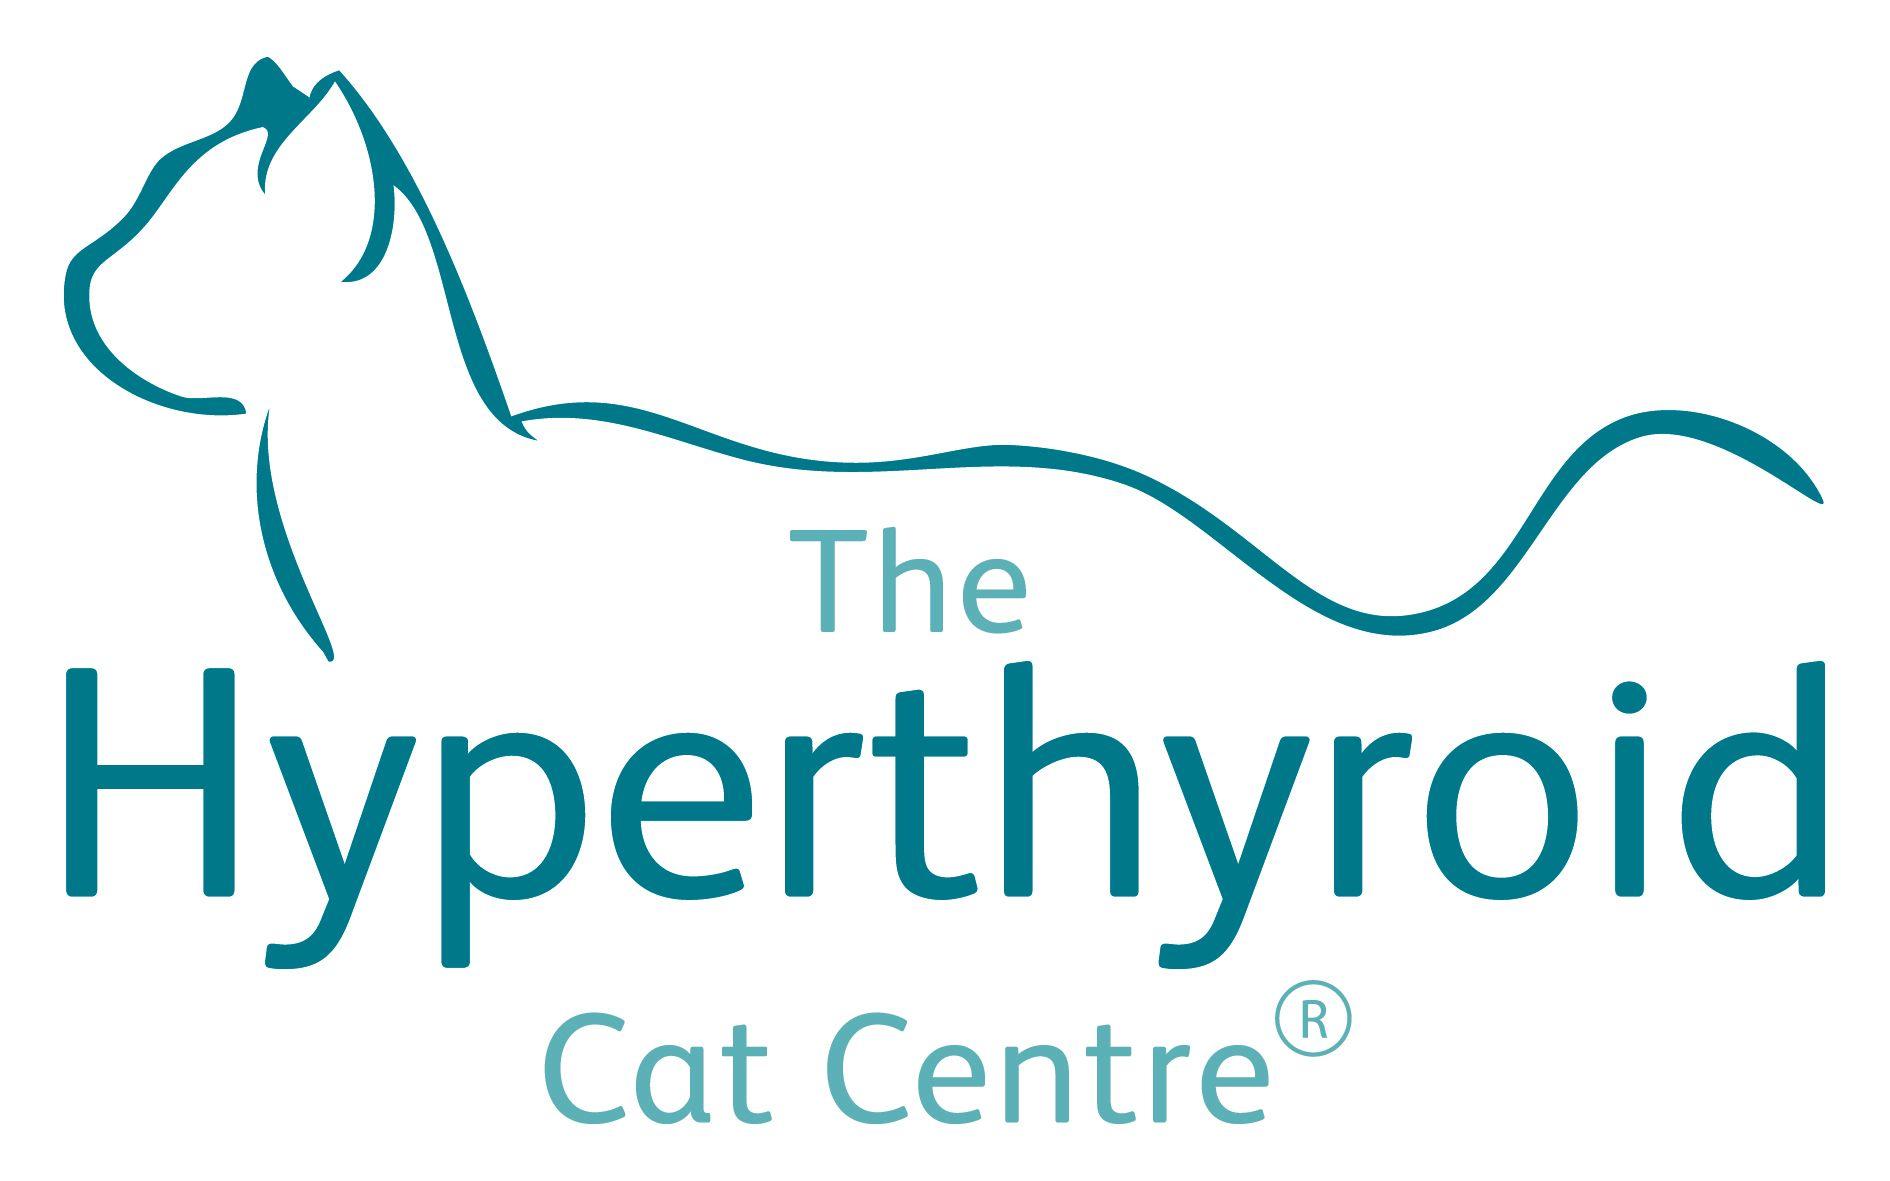 The Hyperthyroid Cat Centre